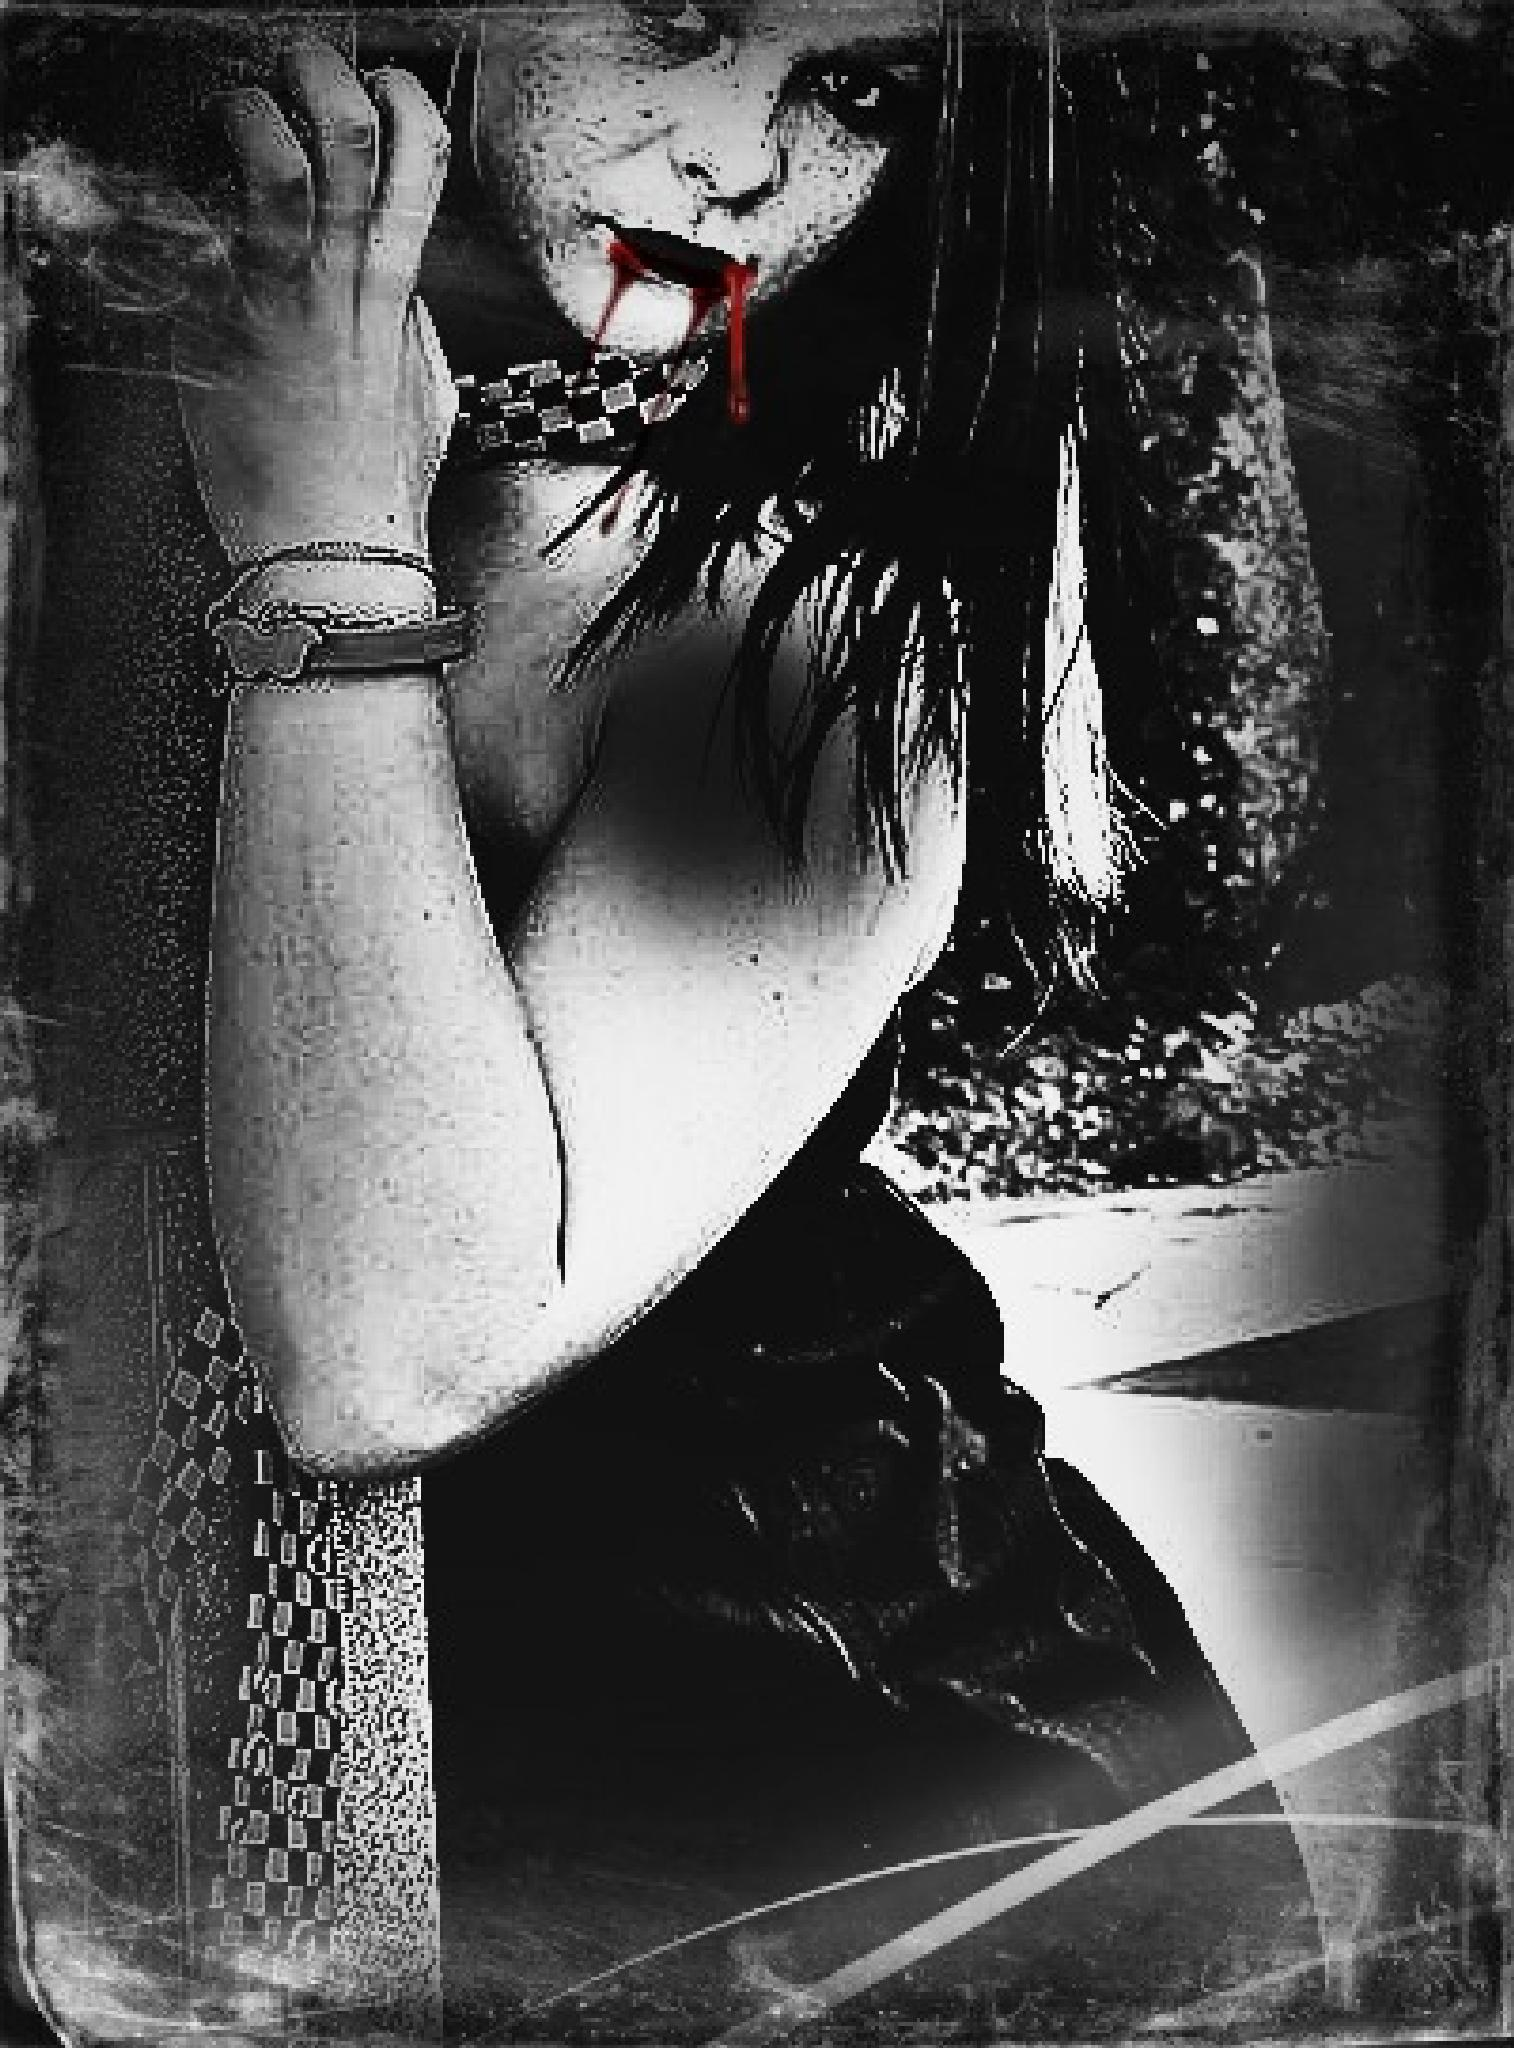 Scary by Irene Billiot Sudduth